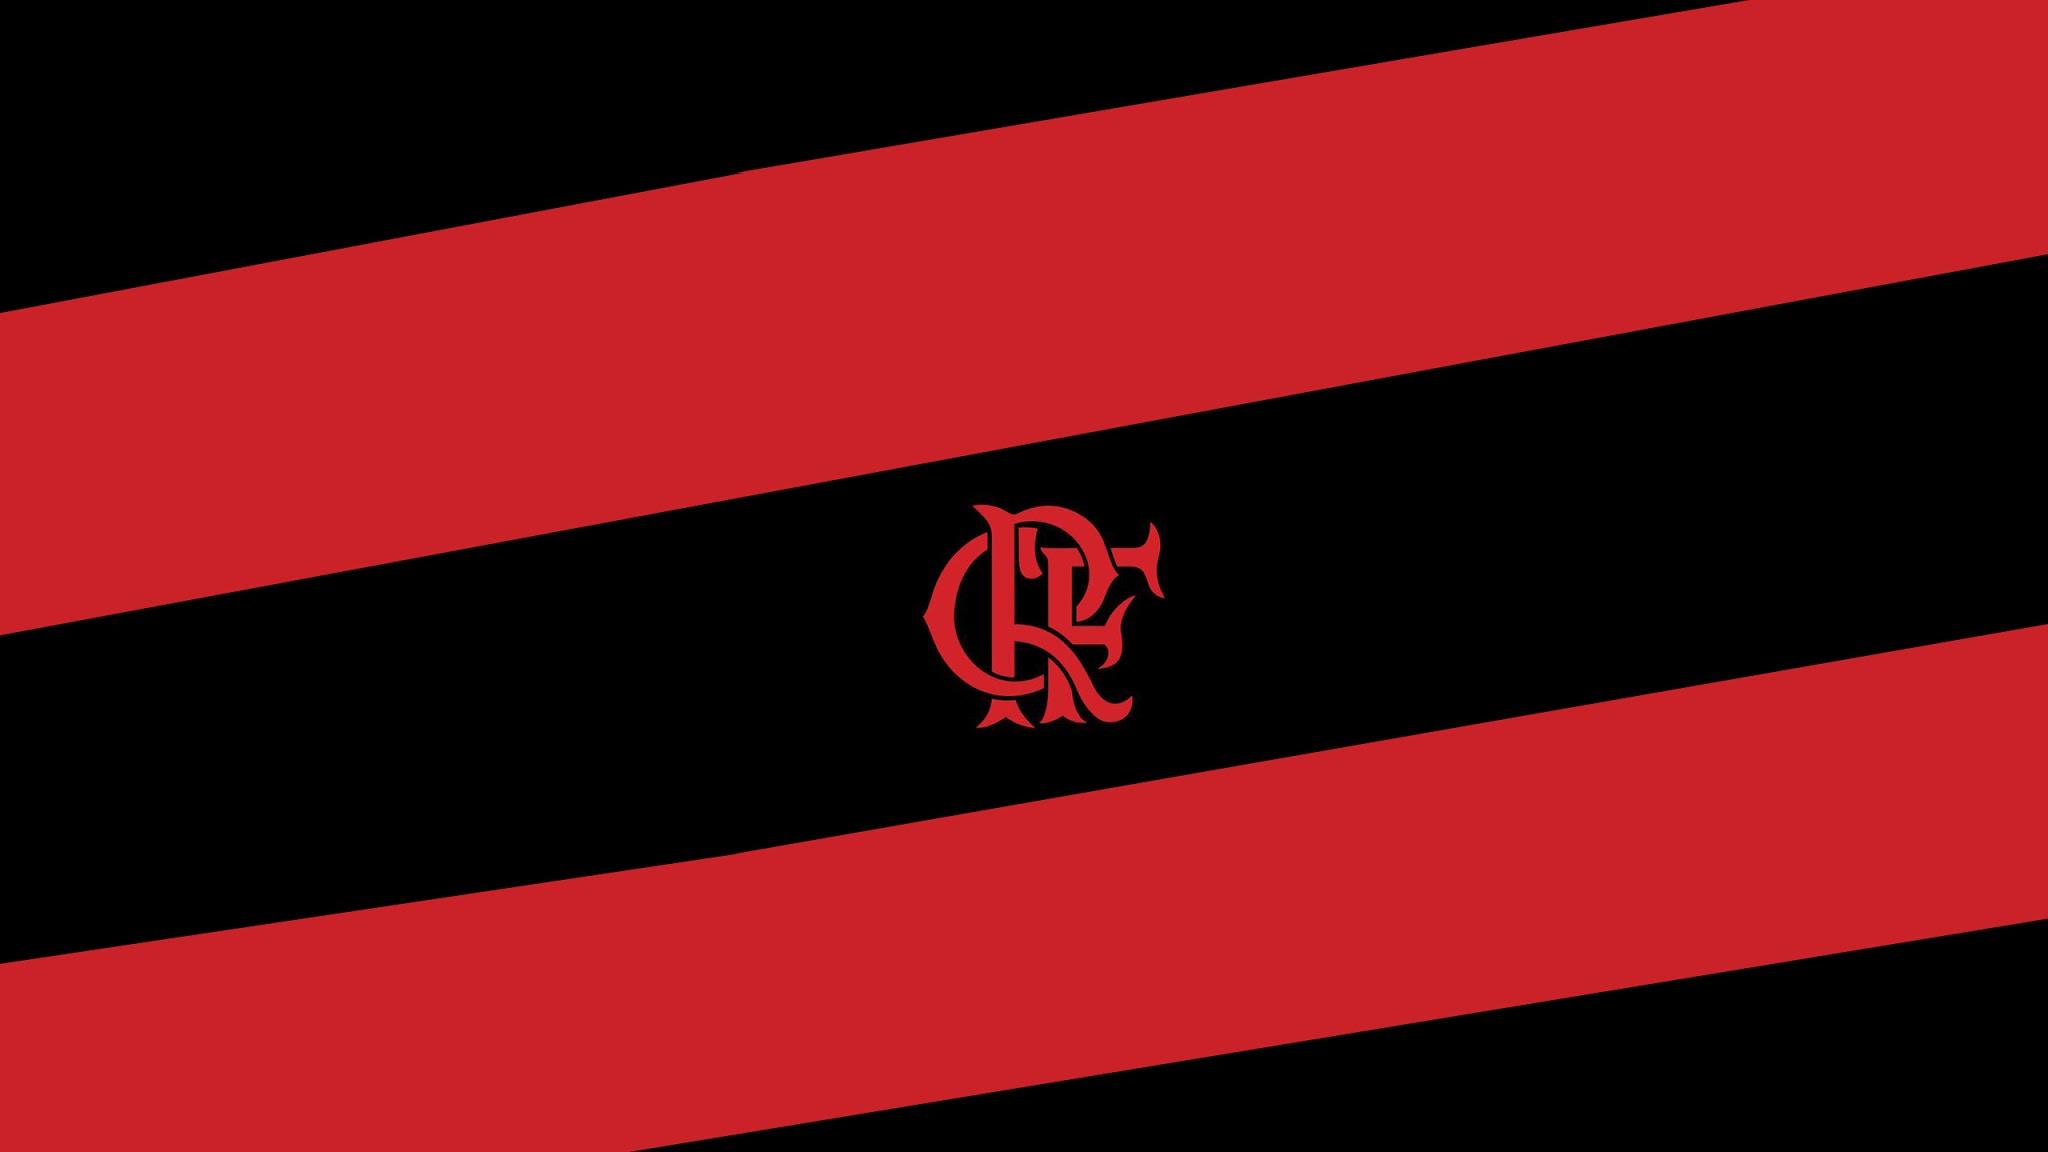 Iphone 10 Wallpaper Hd Papel De Parede Flamengo Papel De Parede Gr 225 Tis Para Pc Hd